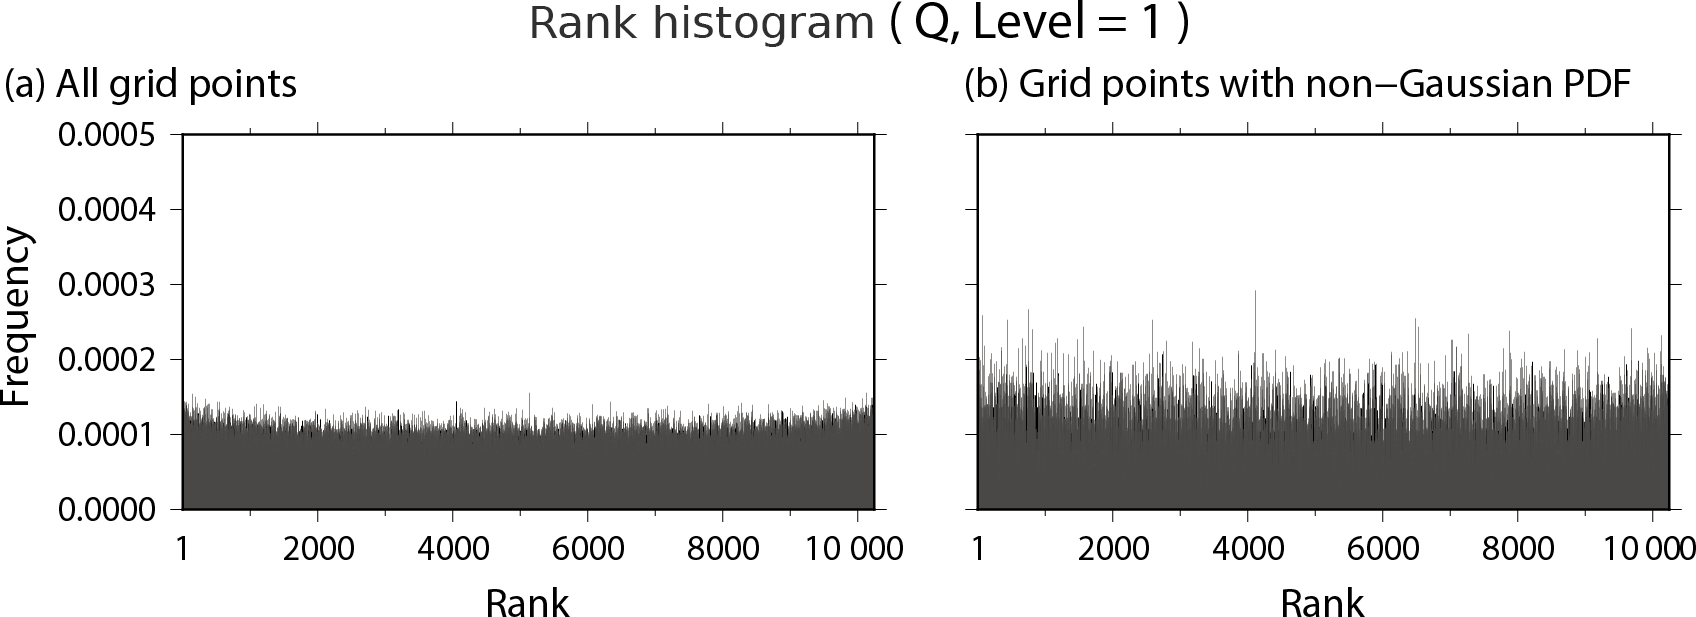 NPG - Non-Gaussian statistics in global atmospheric dynamics